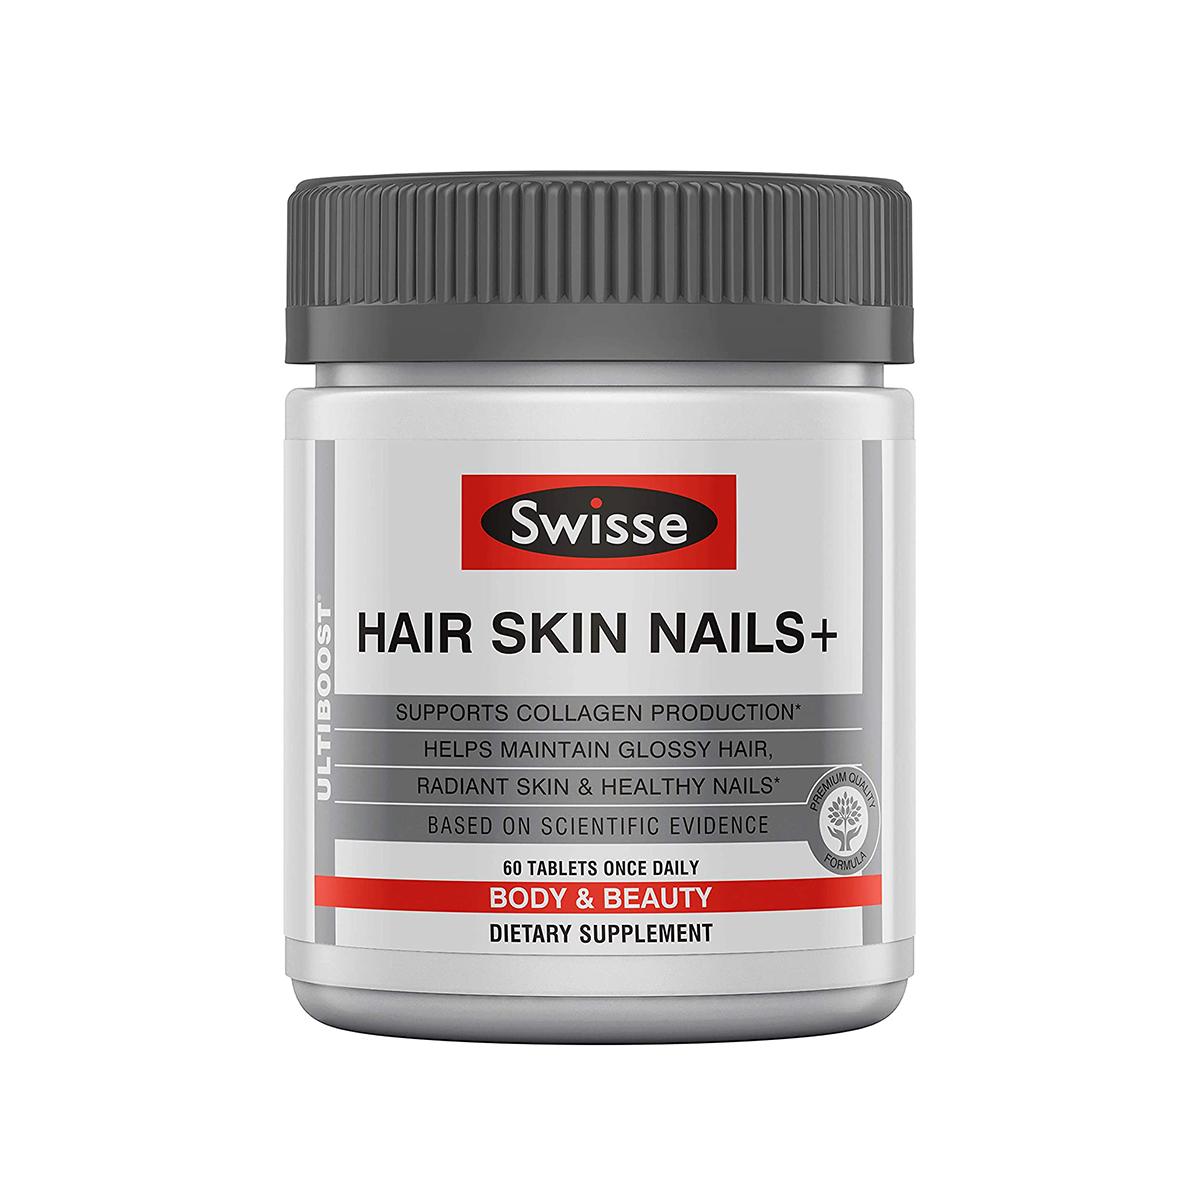 swisse-hair-skin-nails